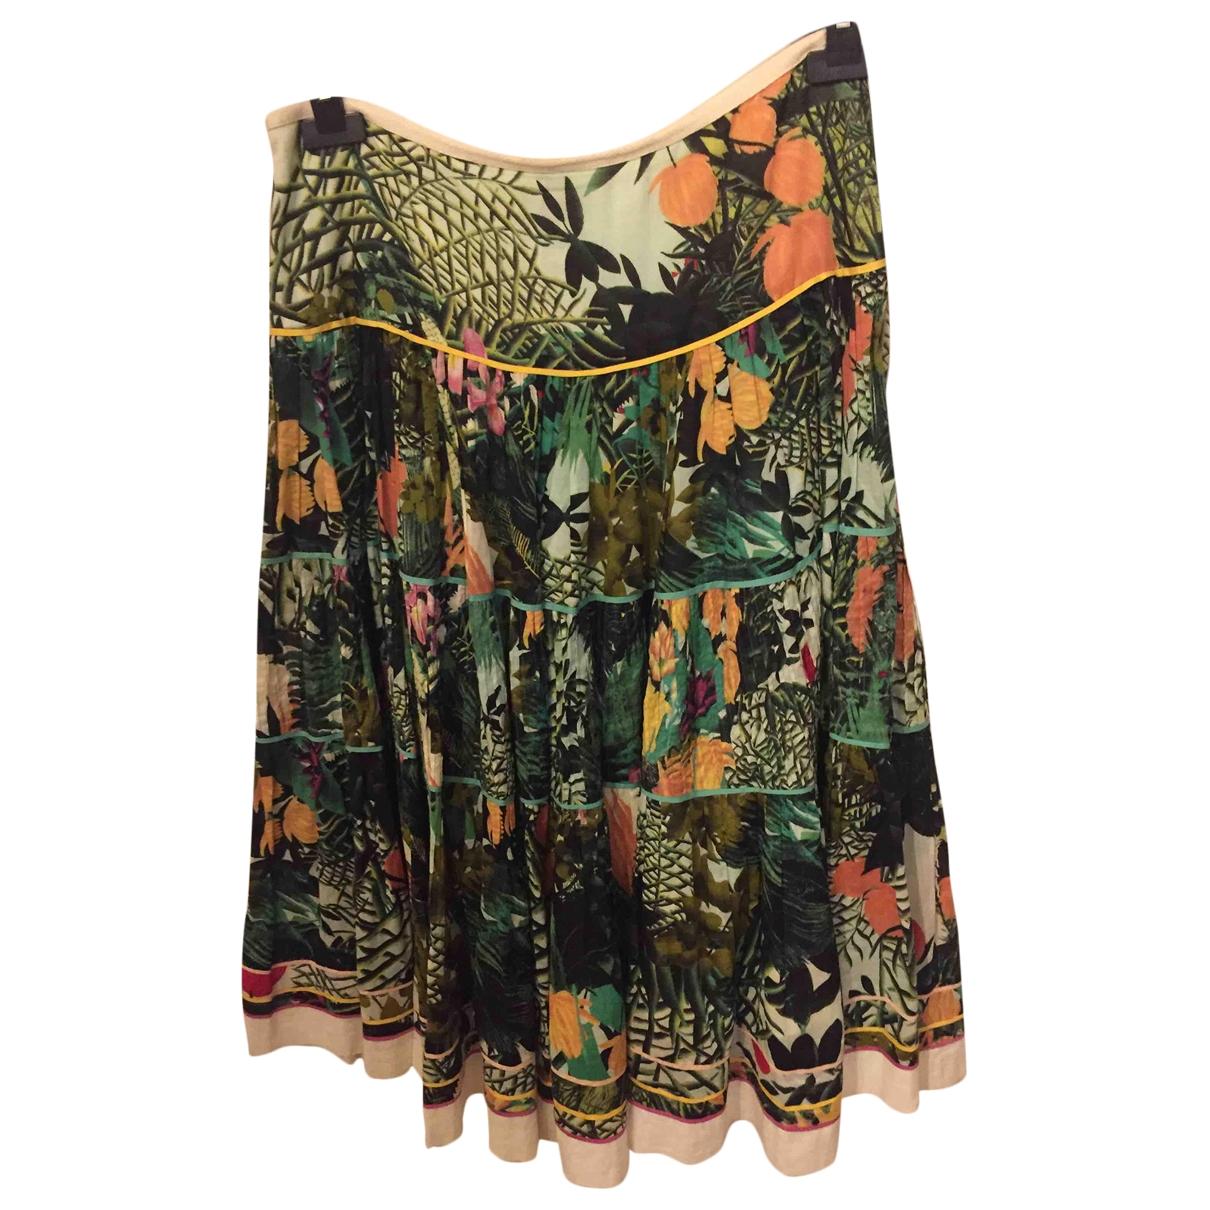 Catherine Malandrino - Jupe   pour femme en coton - multicolore